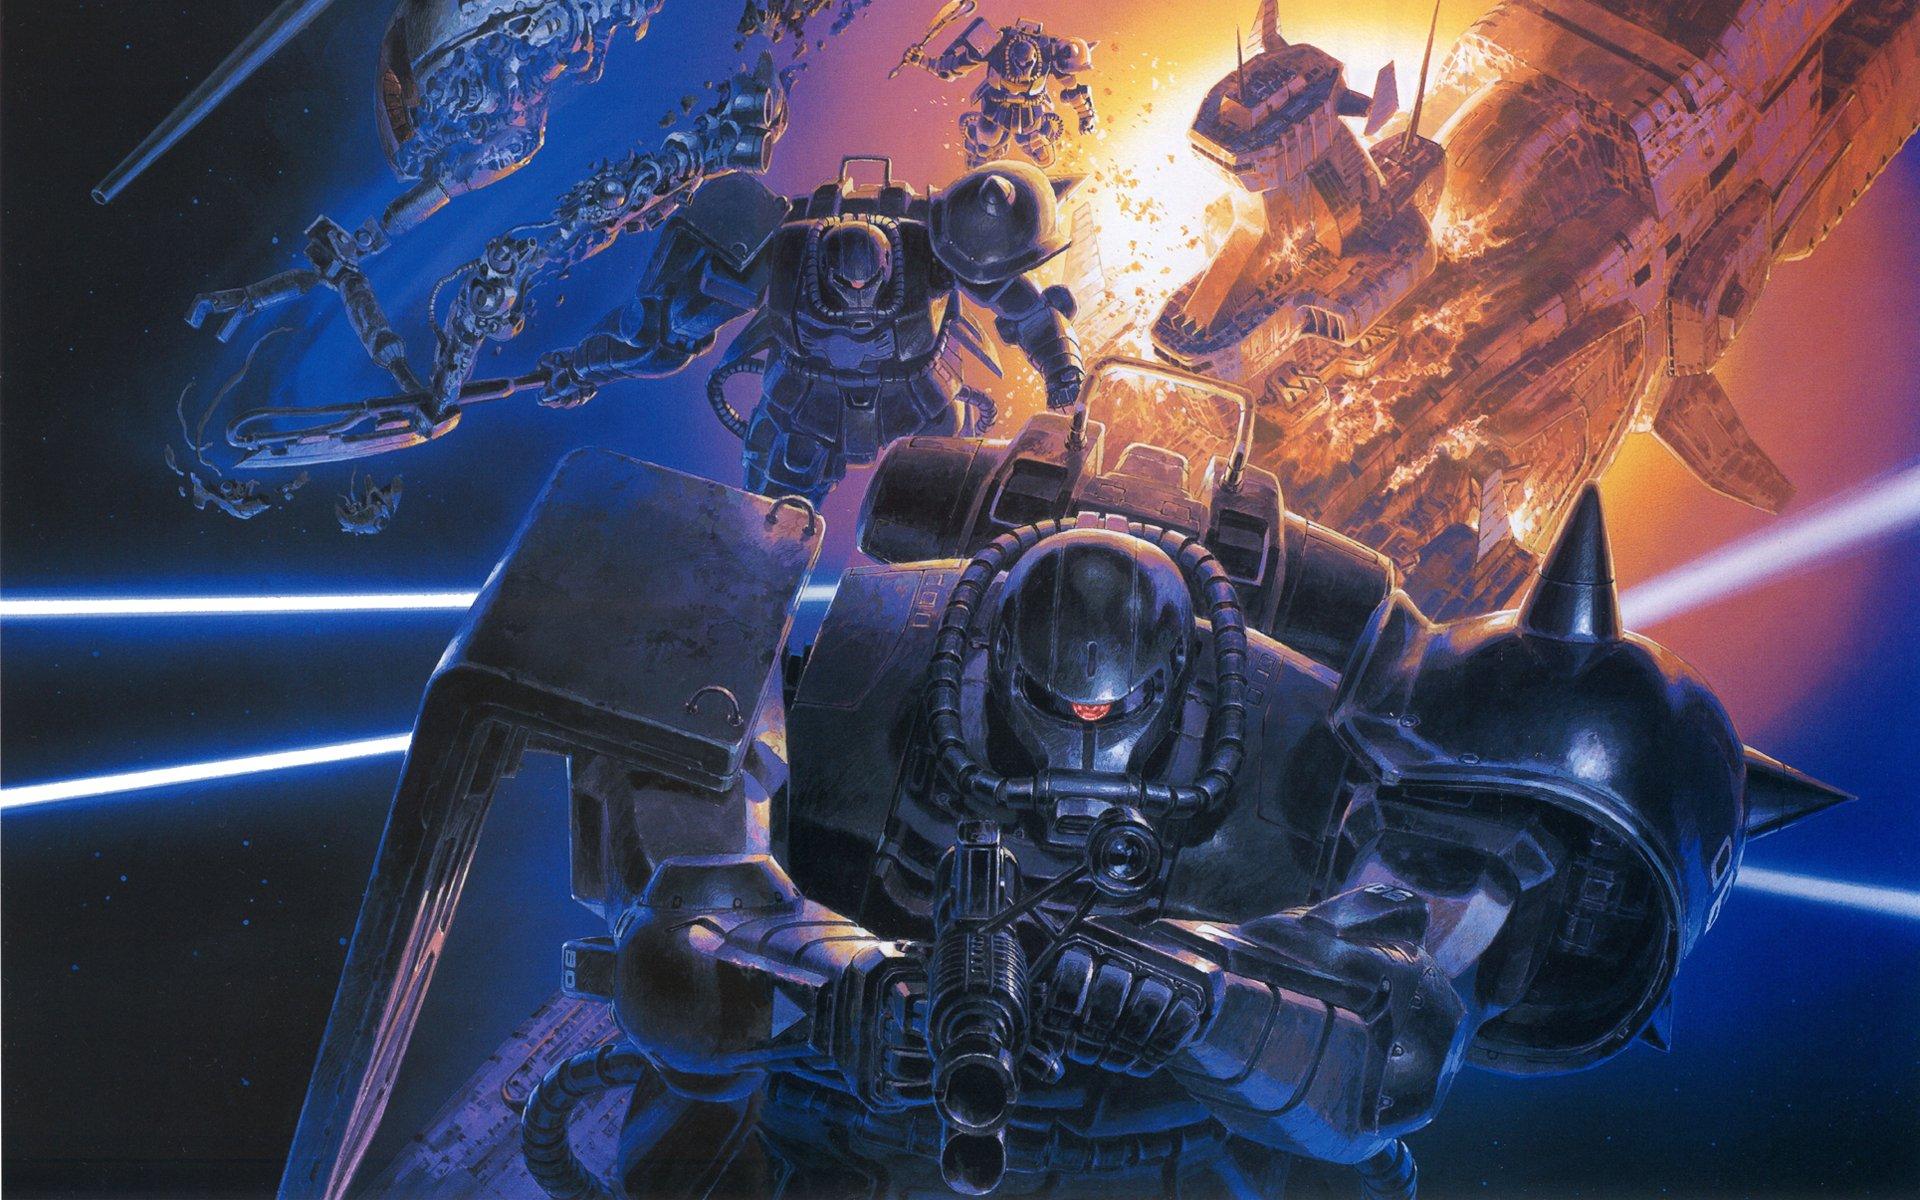 Mobile Suit Gundam zaku wallpaper | 1920x1200 | 234089 ...